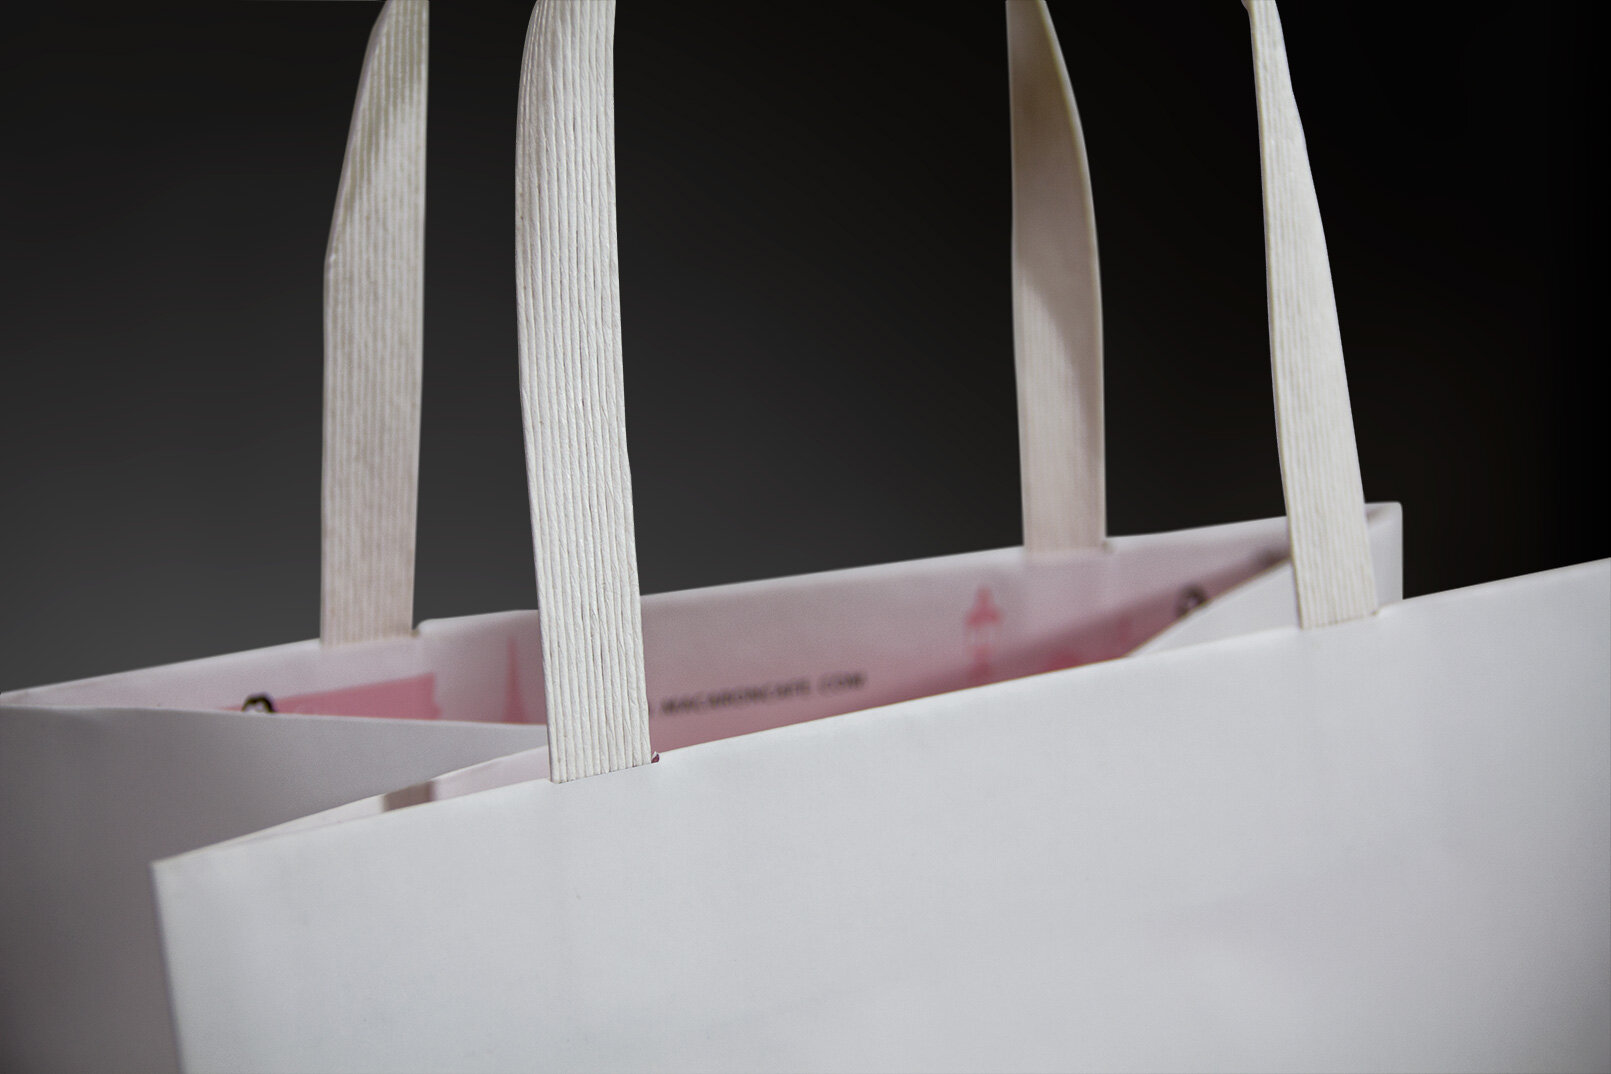 Macaron-Cafe-Shopping-Bag包装设计.jpg